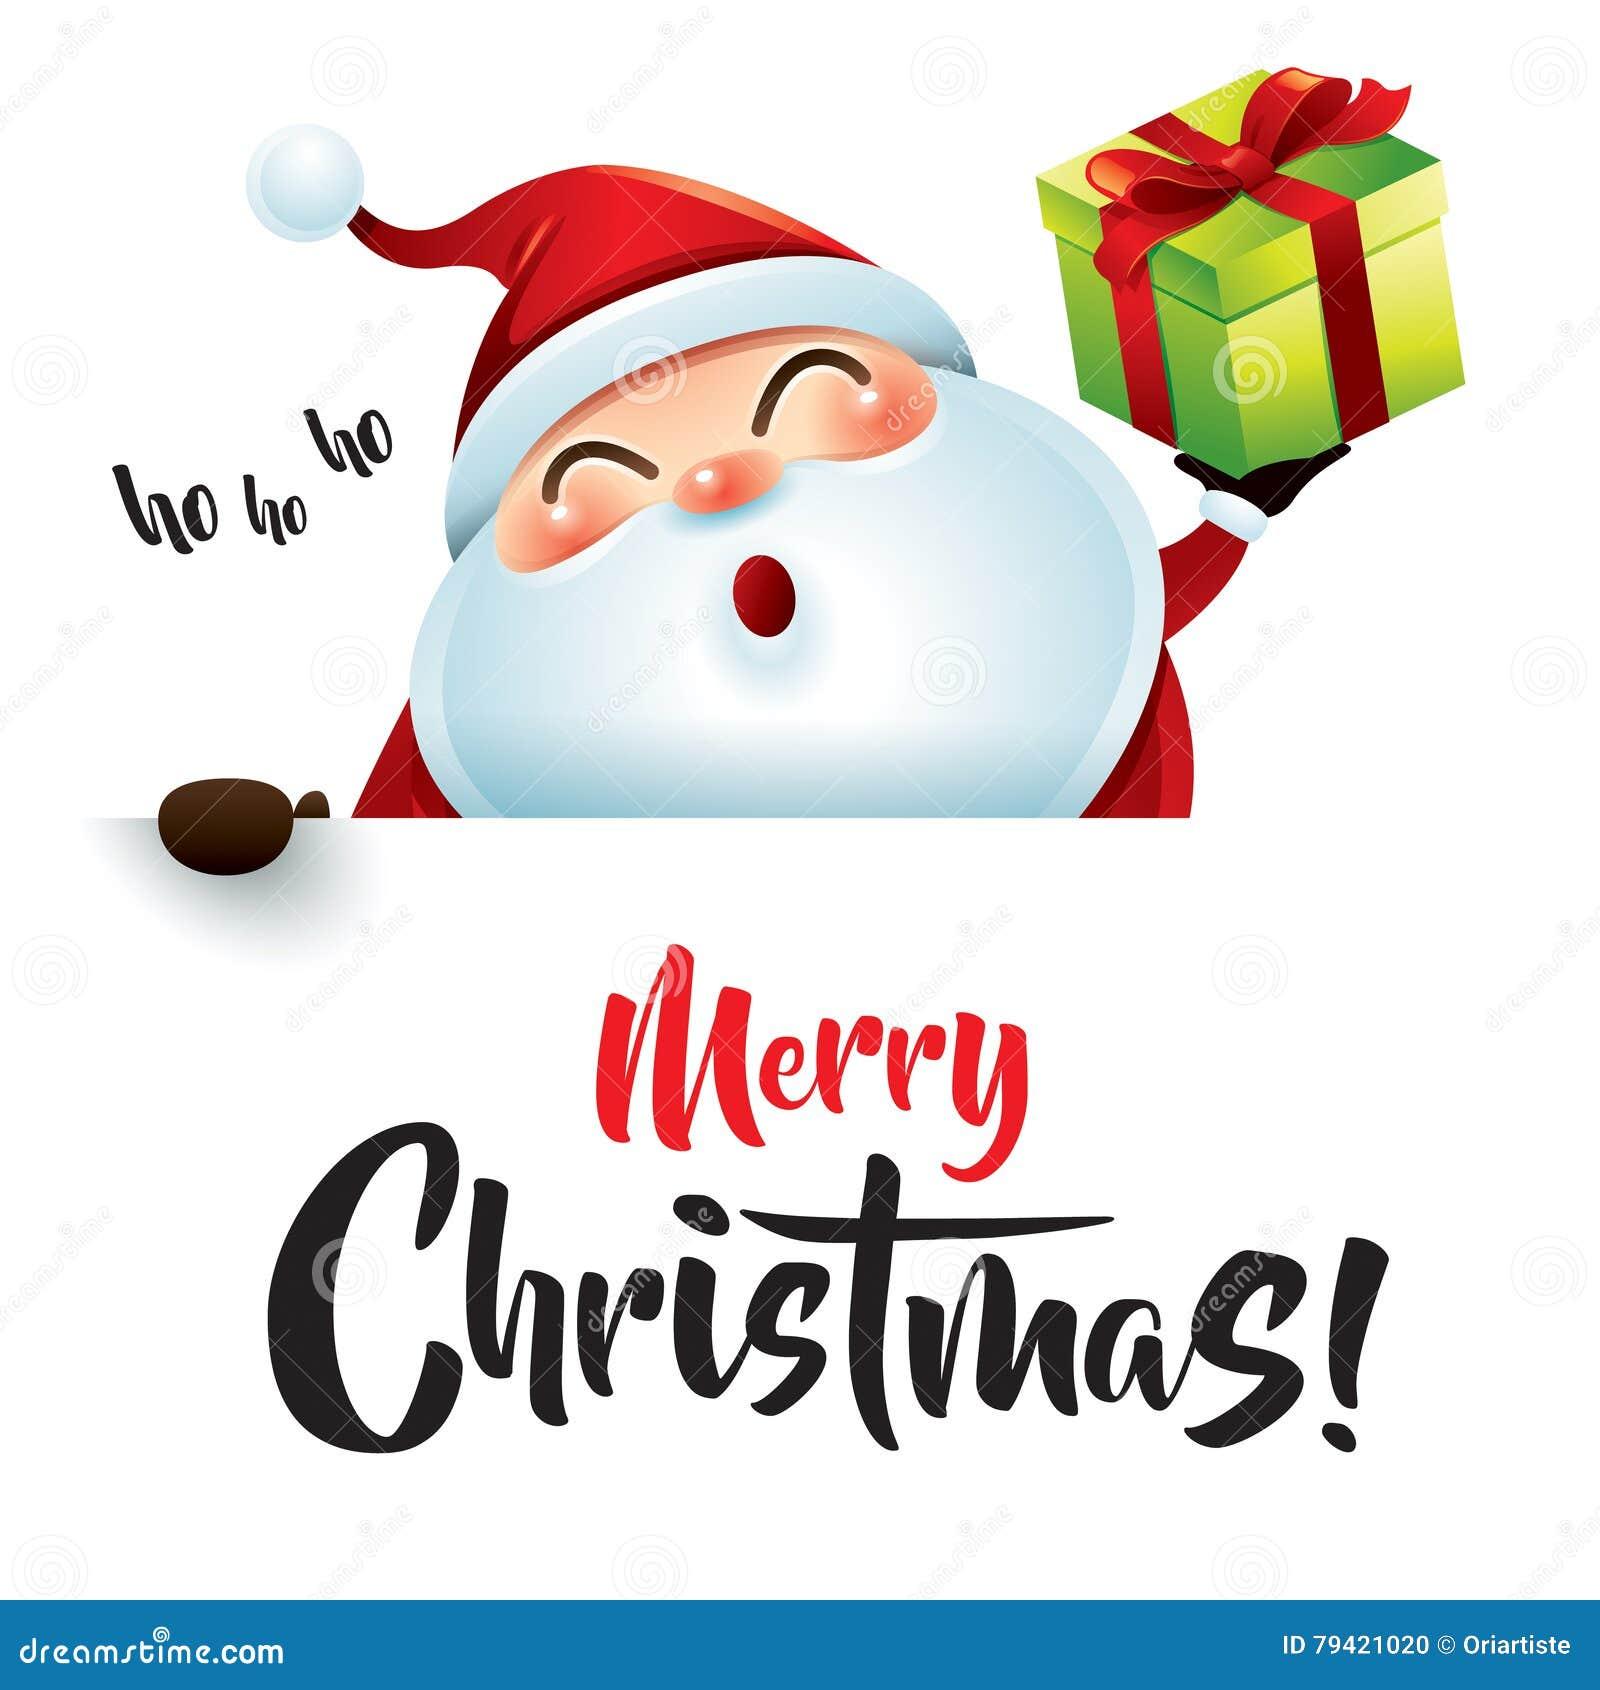 download ho ho ho merry christmas stock vector illustration of smiling 79421020 - Hohoho Merry Christmas